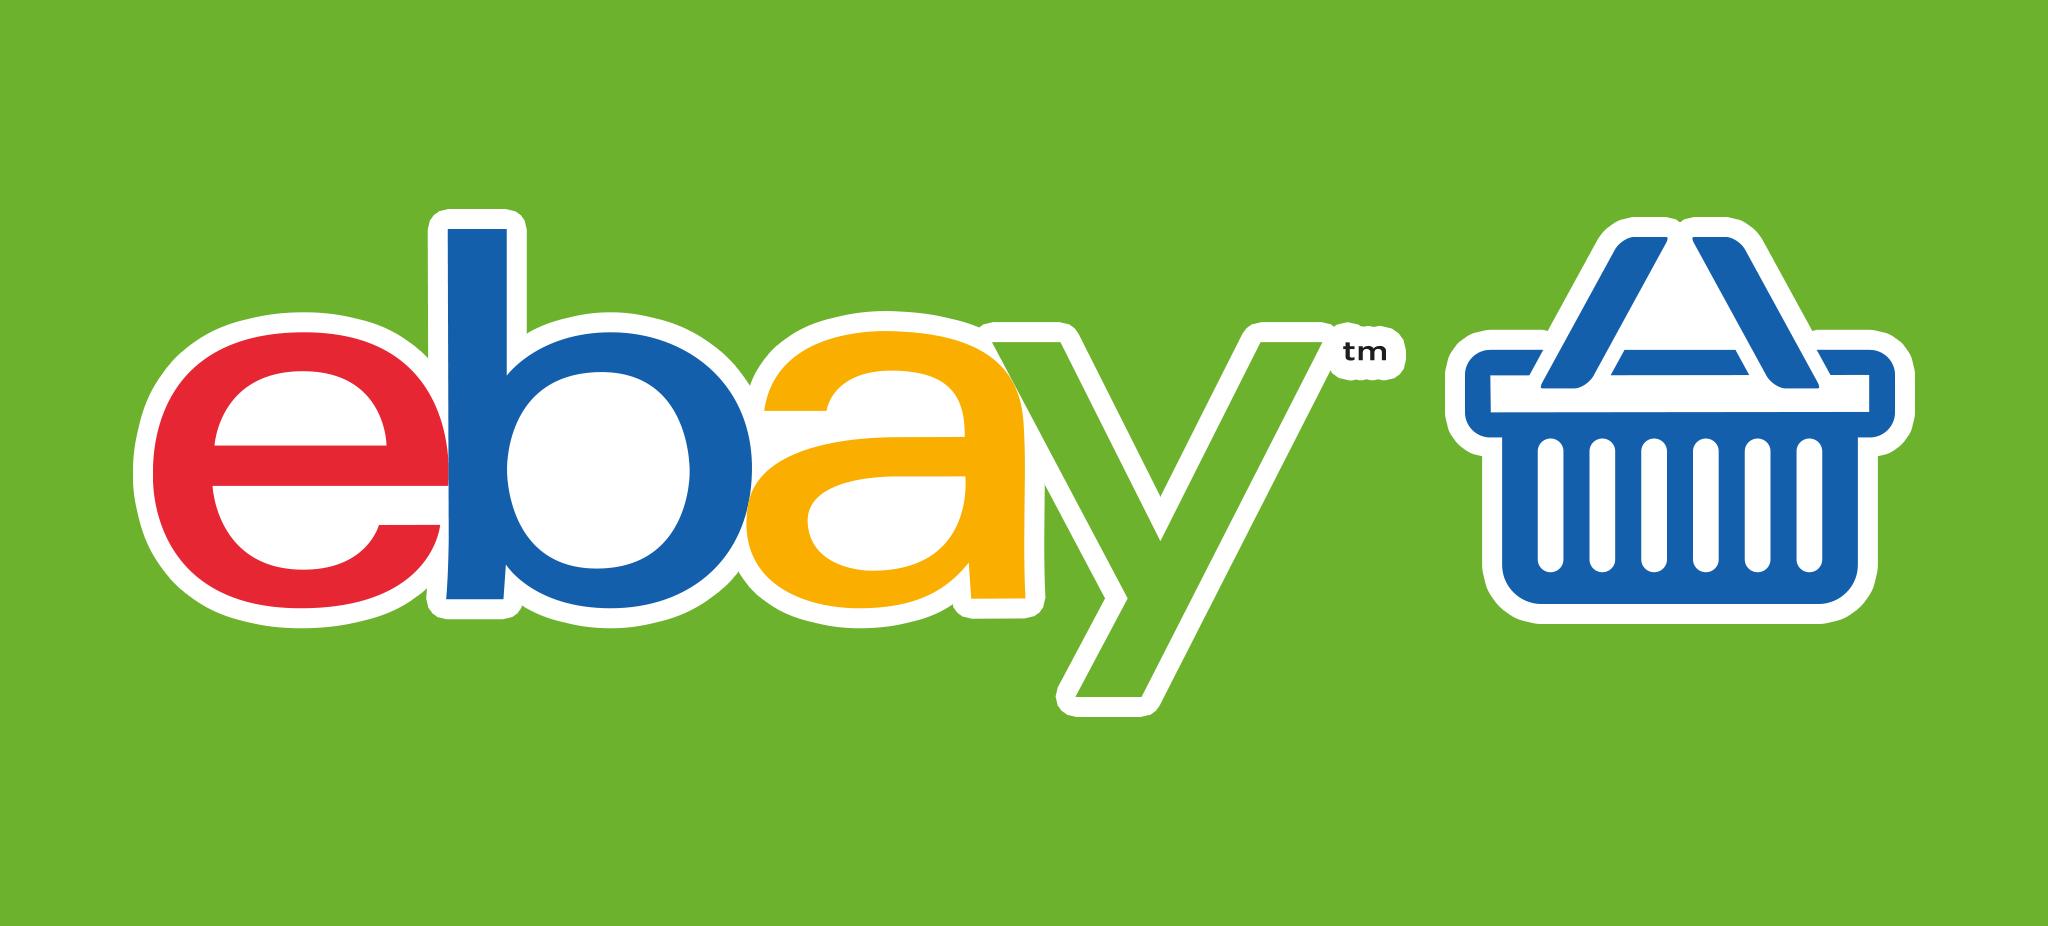 Balance CBD eBay Promo Code